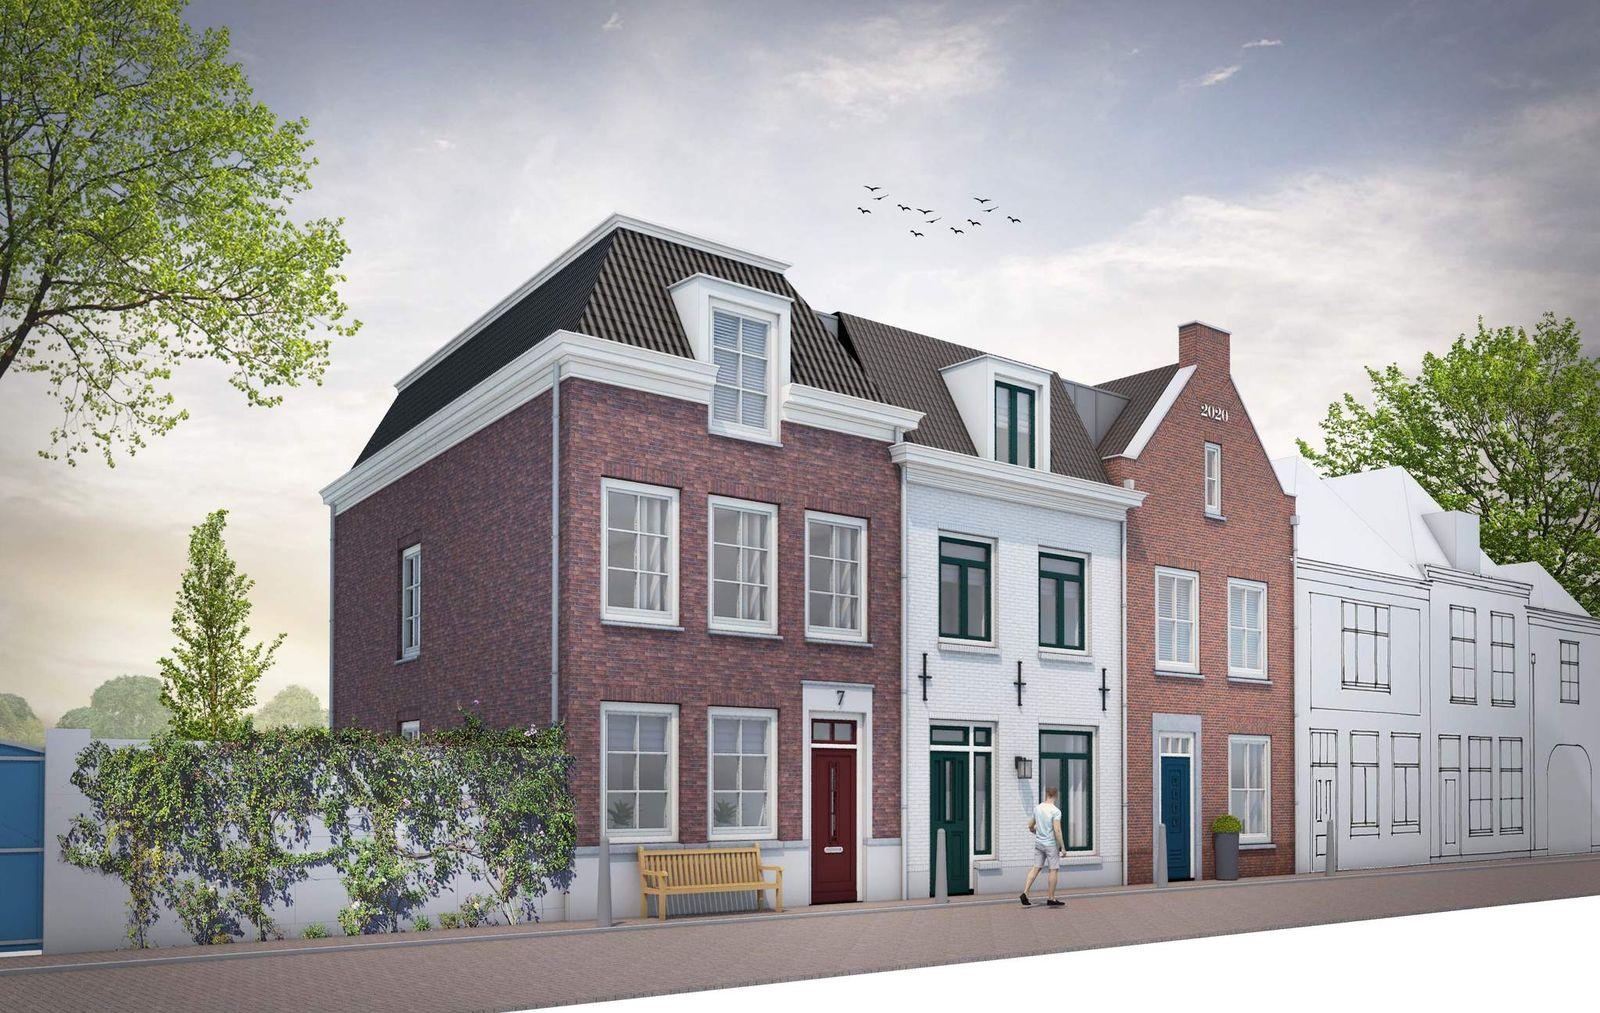 Kerkstraat 7-b, Zaltbommel